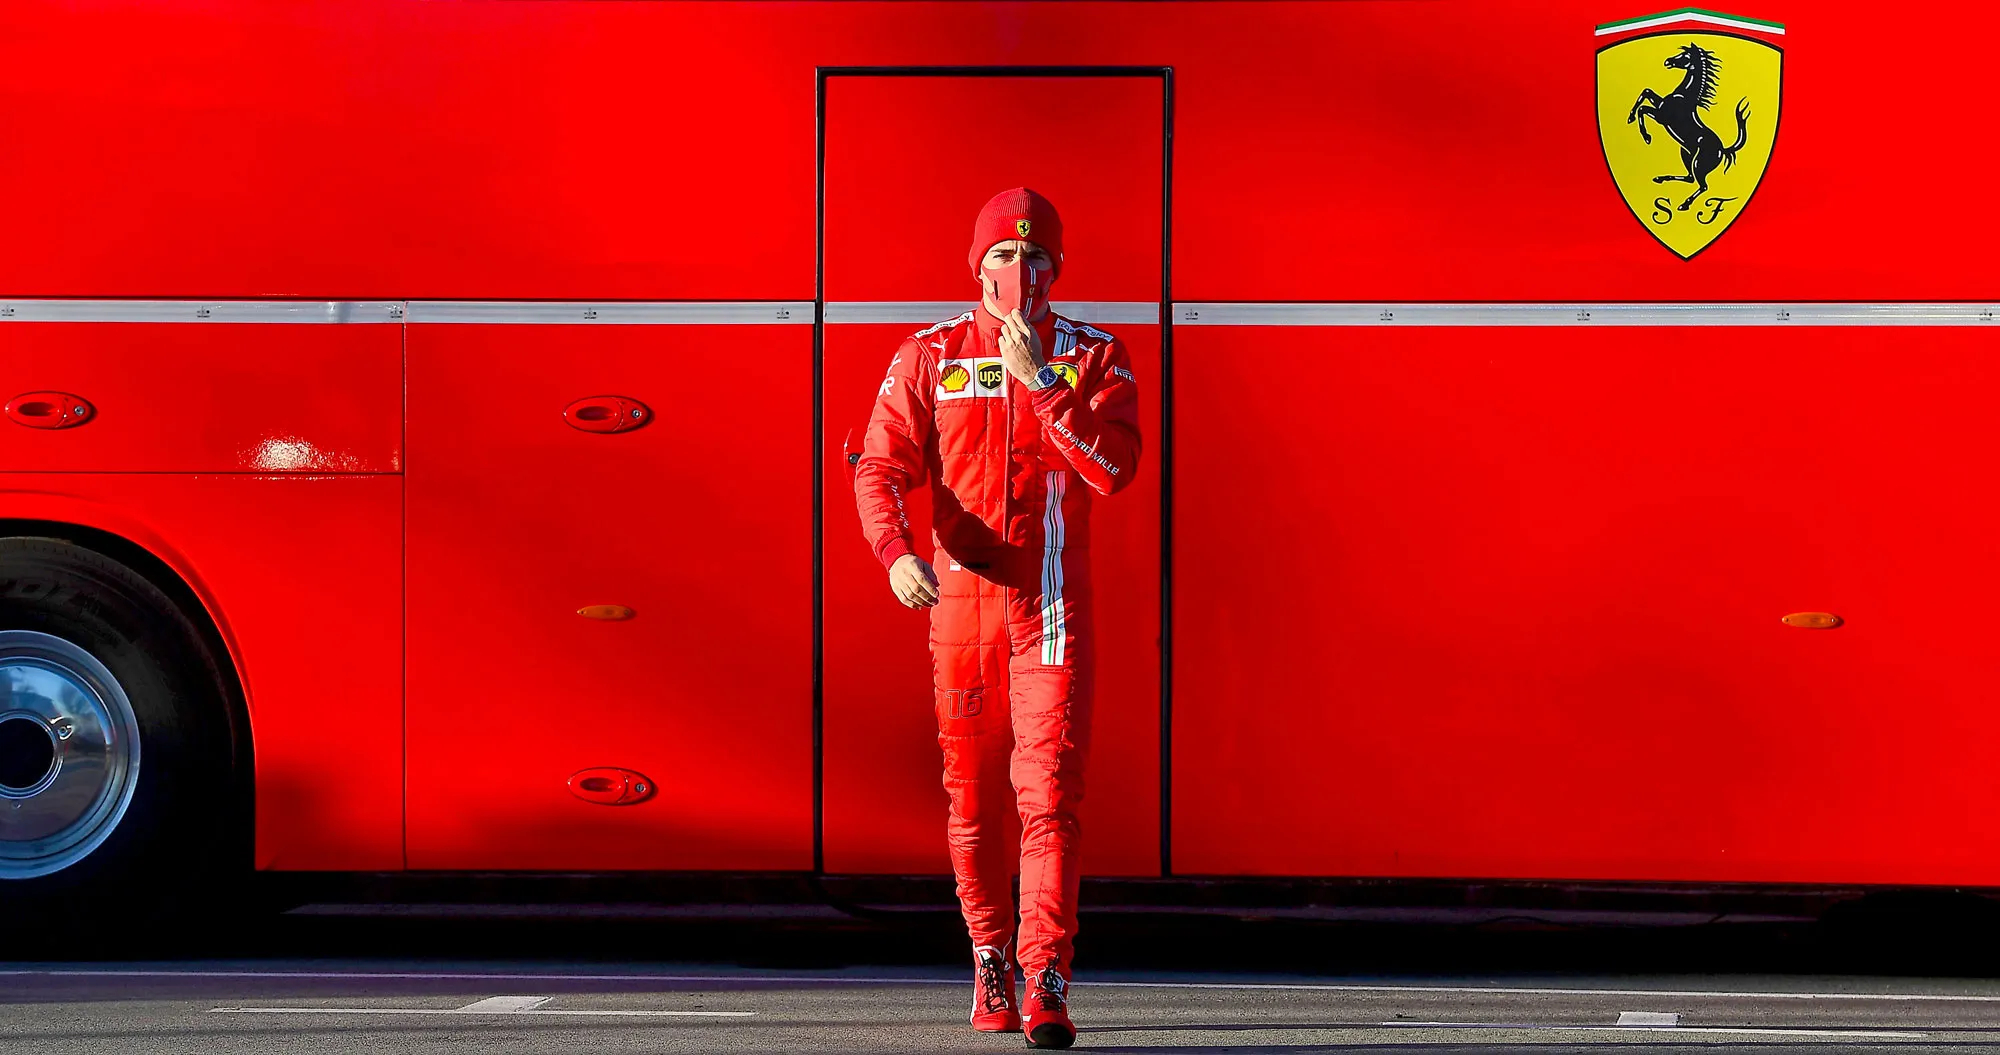 Richard Mille's partnership with Ferrari is shaking up F1 sponsorship